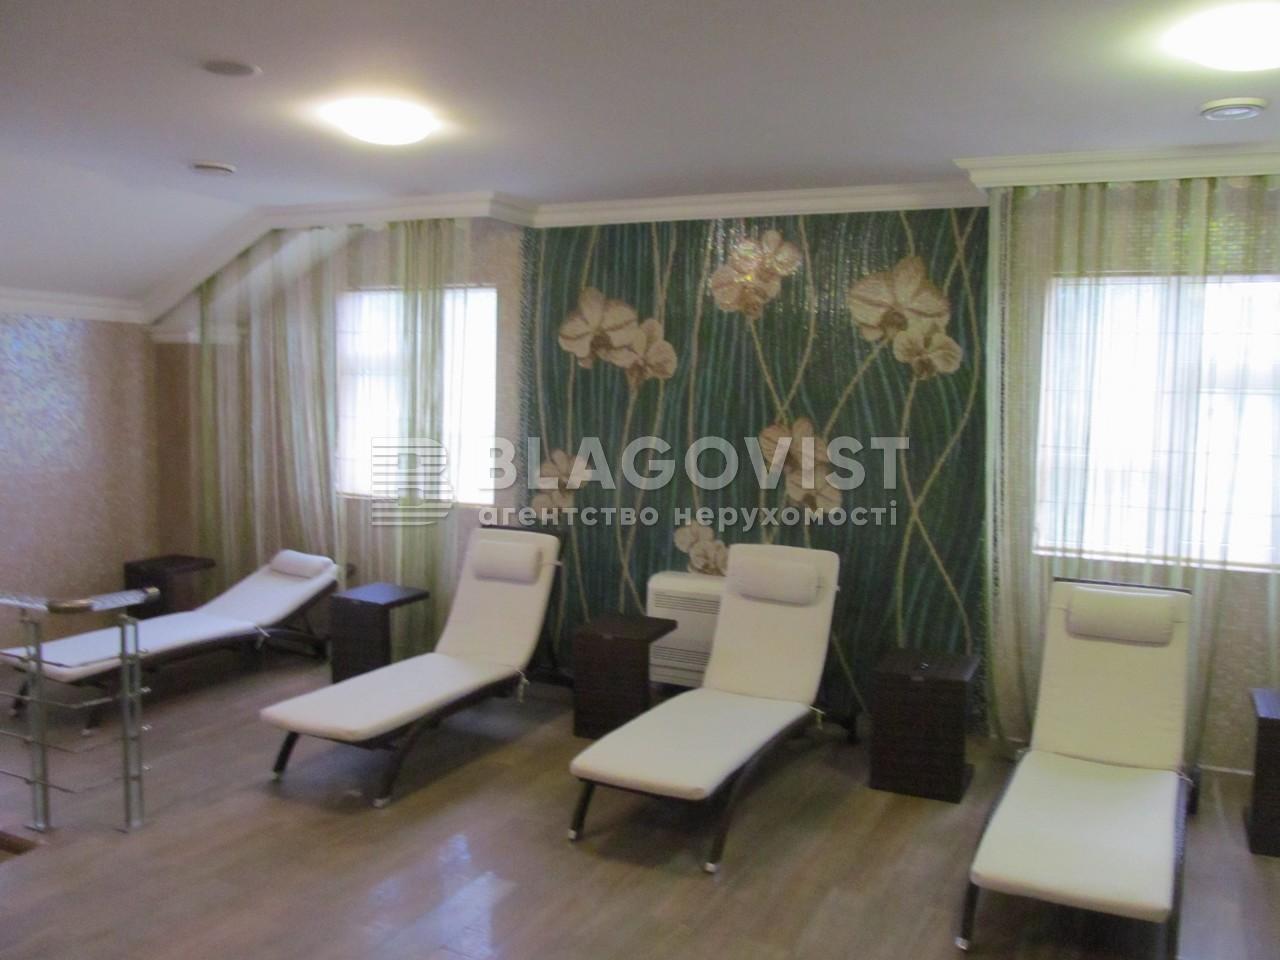 Нежитлове приміщення, H-37155, Садова (Осокорки), Київ - Фото 20